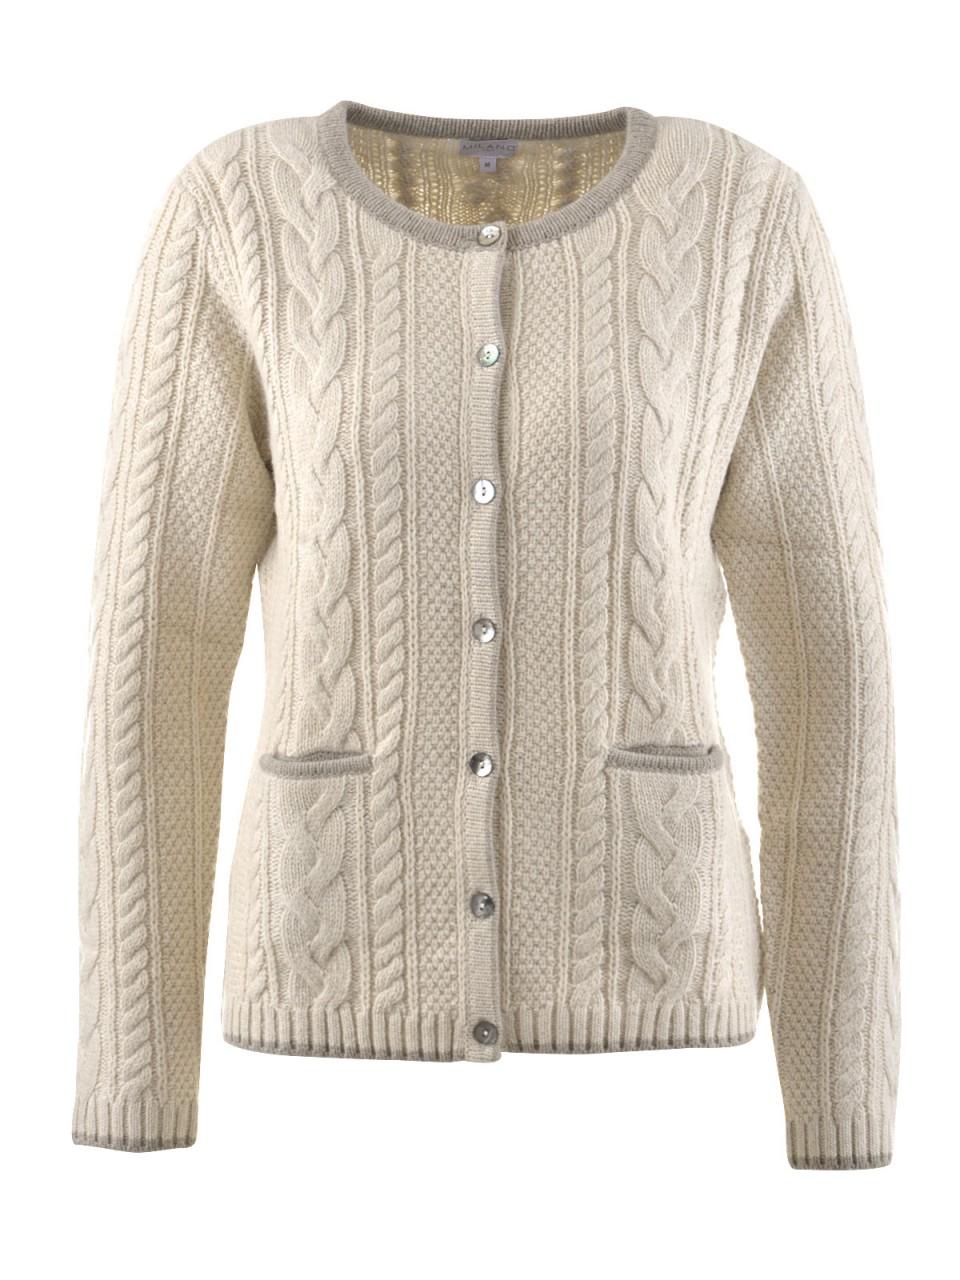 Jacken - MILANO ITALY Damen Strickjacke, beige  - Onlineshop Designermode.com